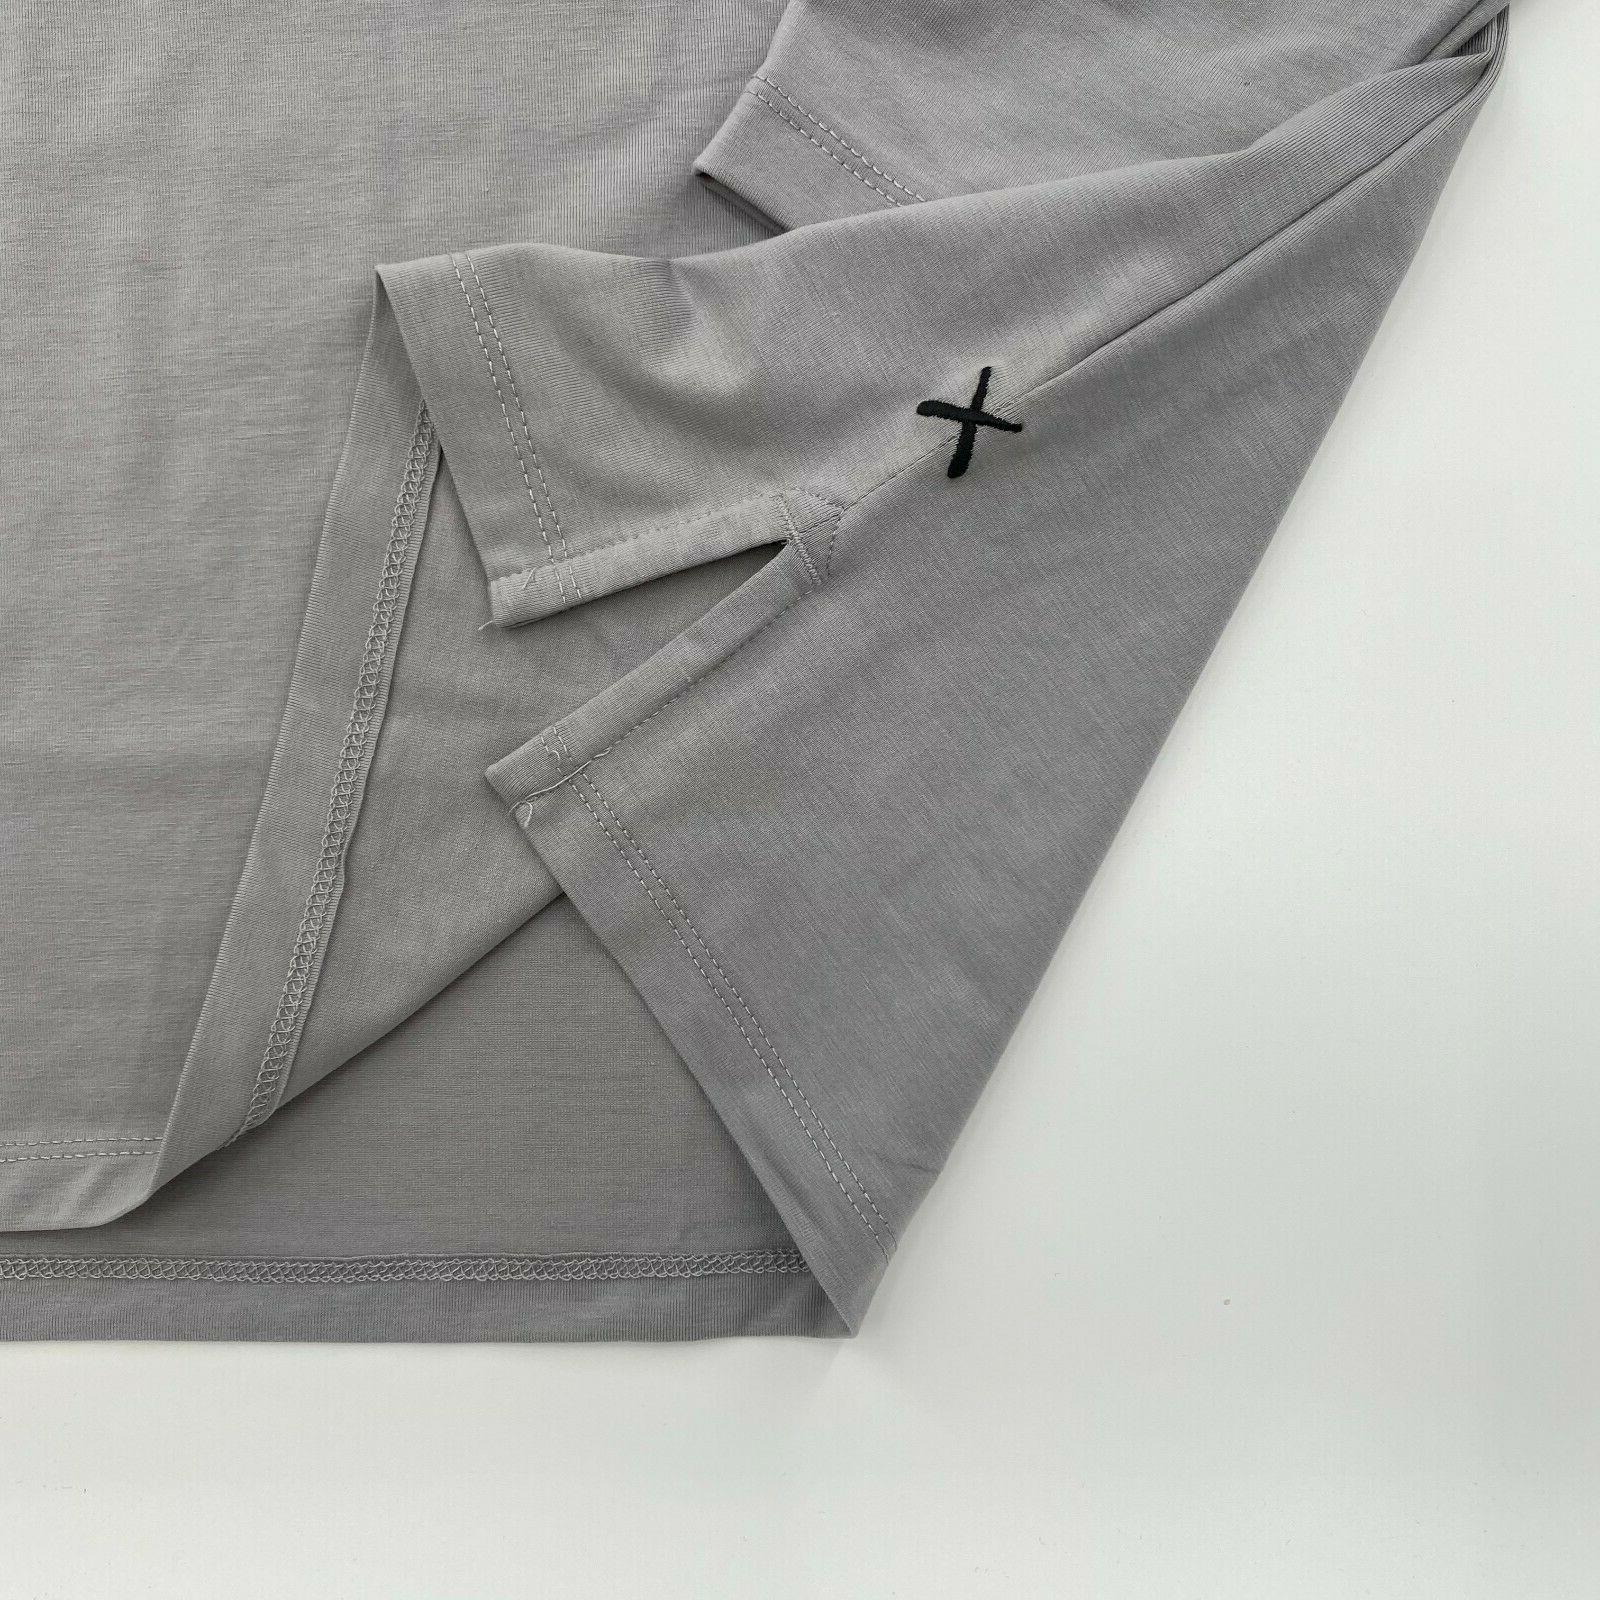 Cuts Clothing Men Sleeve Hem Henley T-Shirt Gray M XL